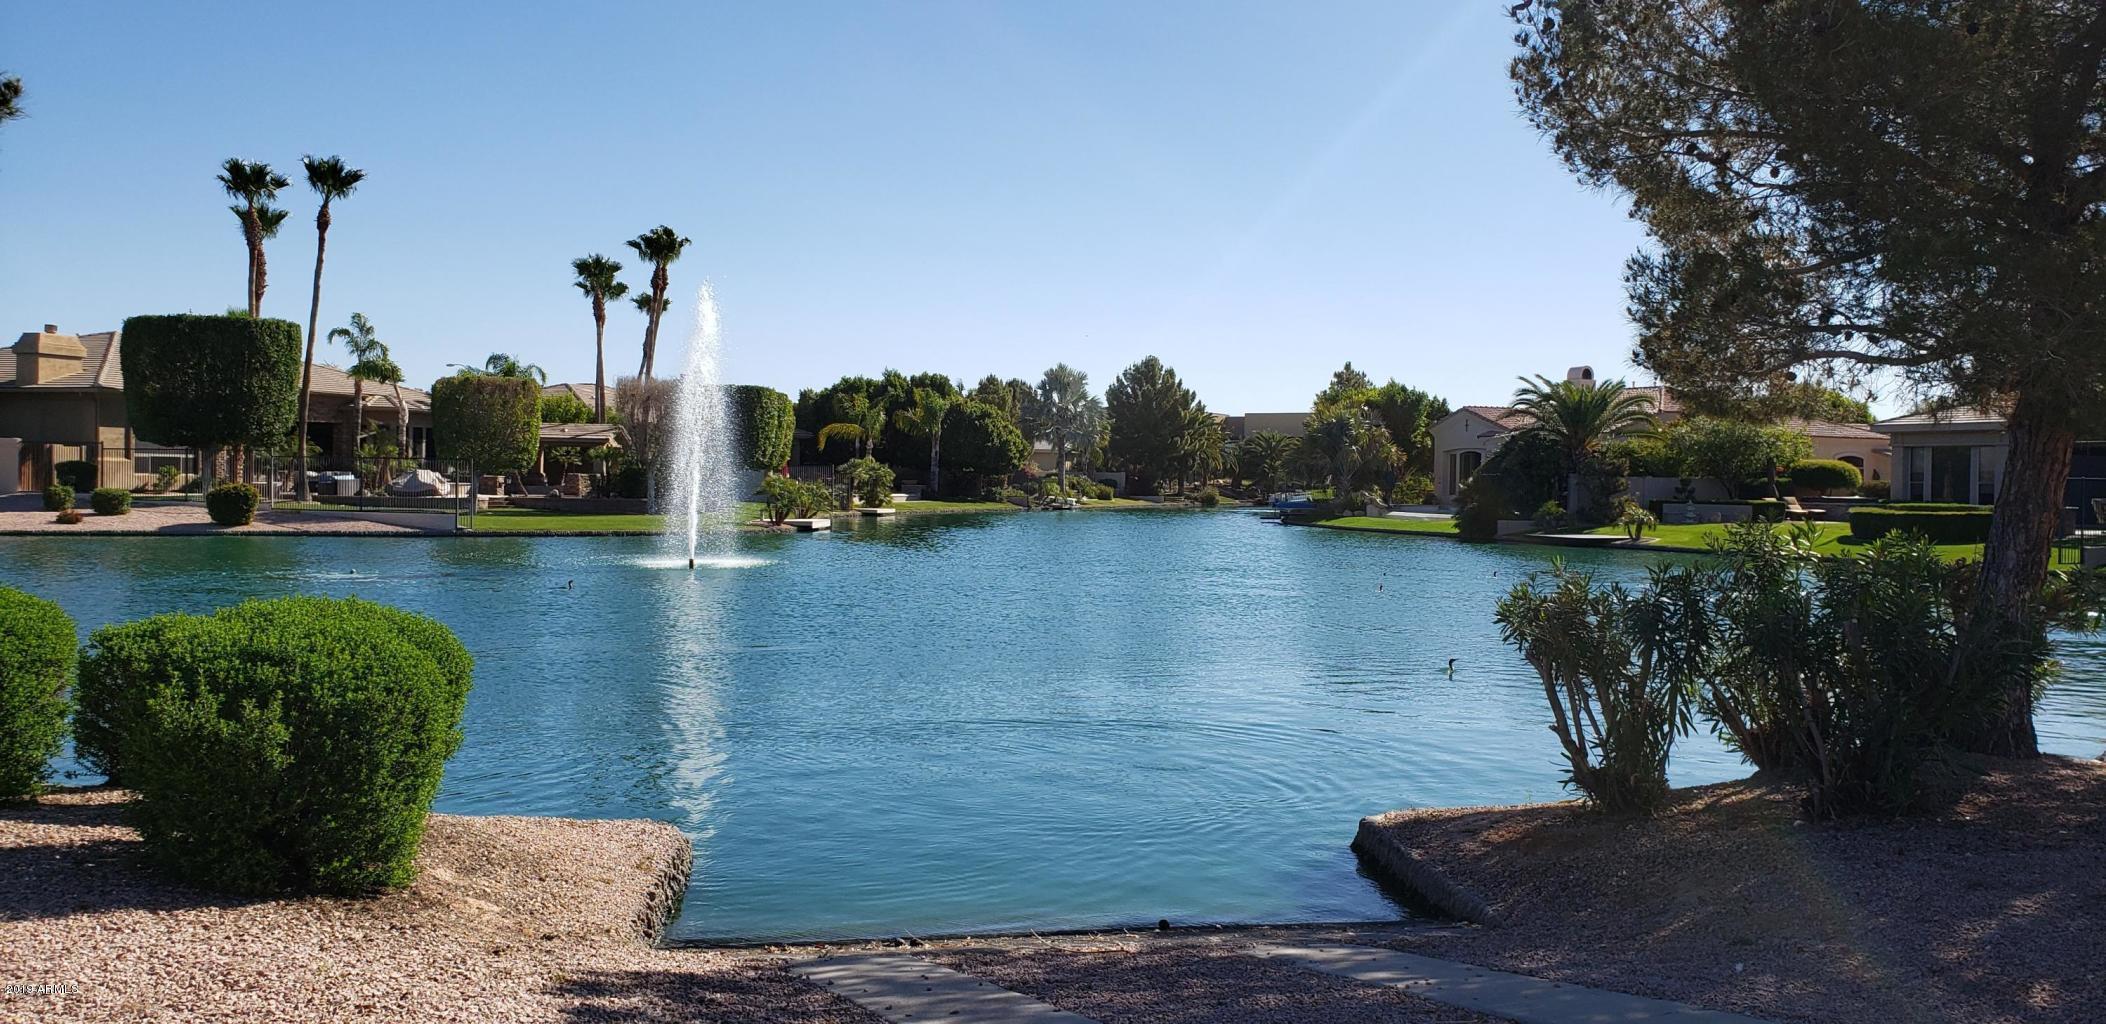 MLS 5912031 1777 W YOSEMITE Place, Chandler, AZ 85248 Ocotillo